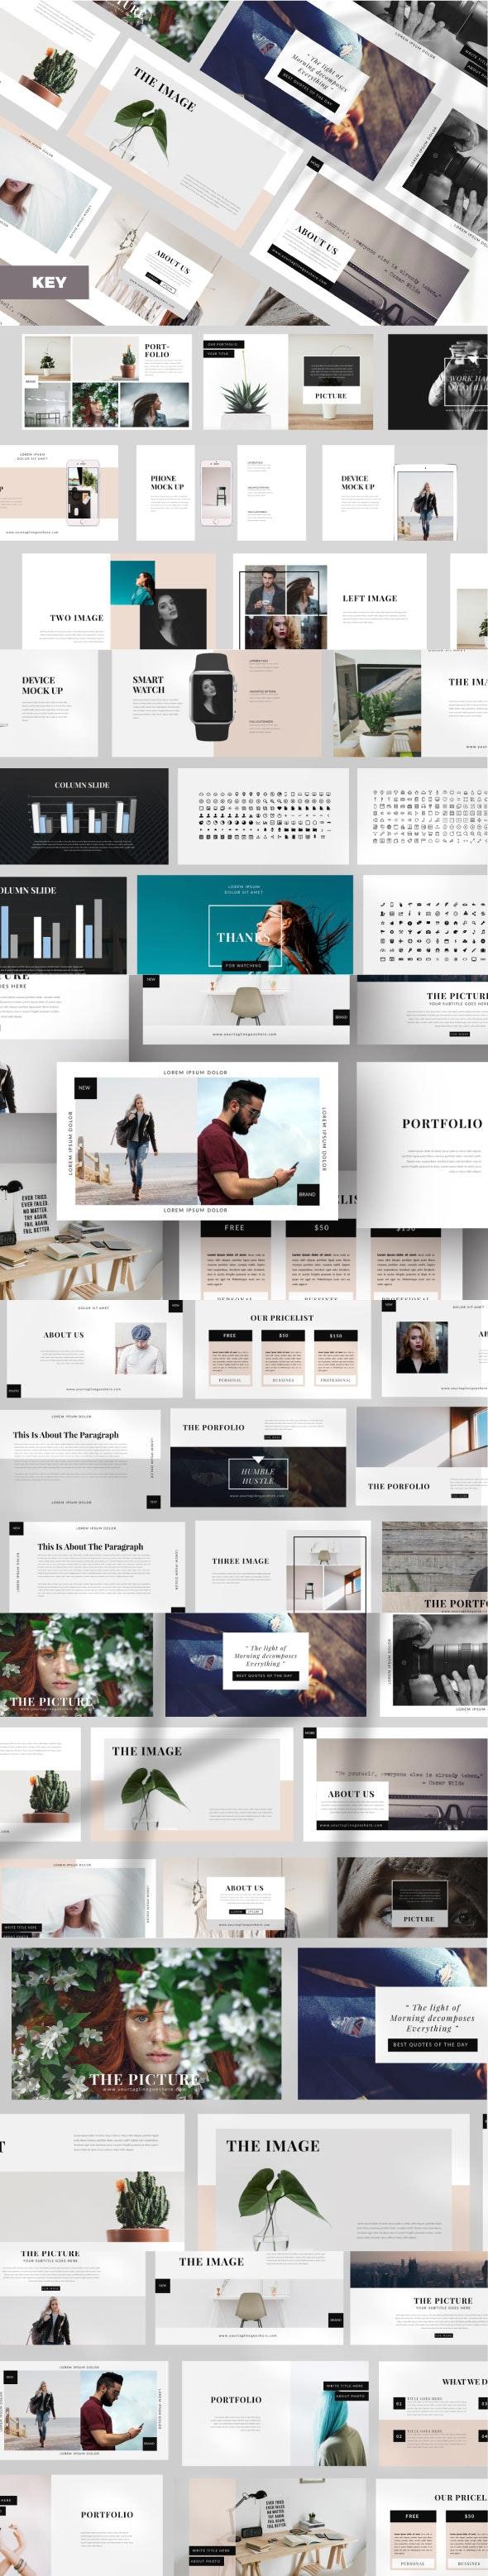 Elegant Business Keynote - Business Keynote Templates